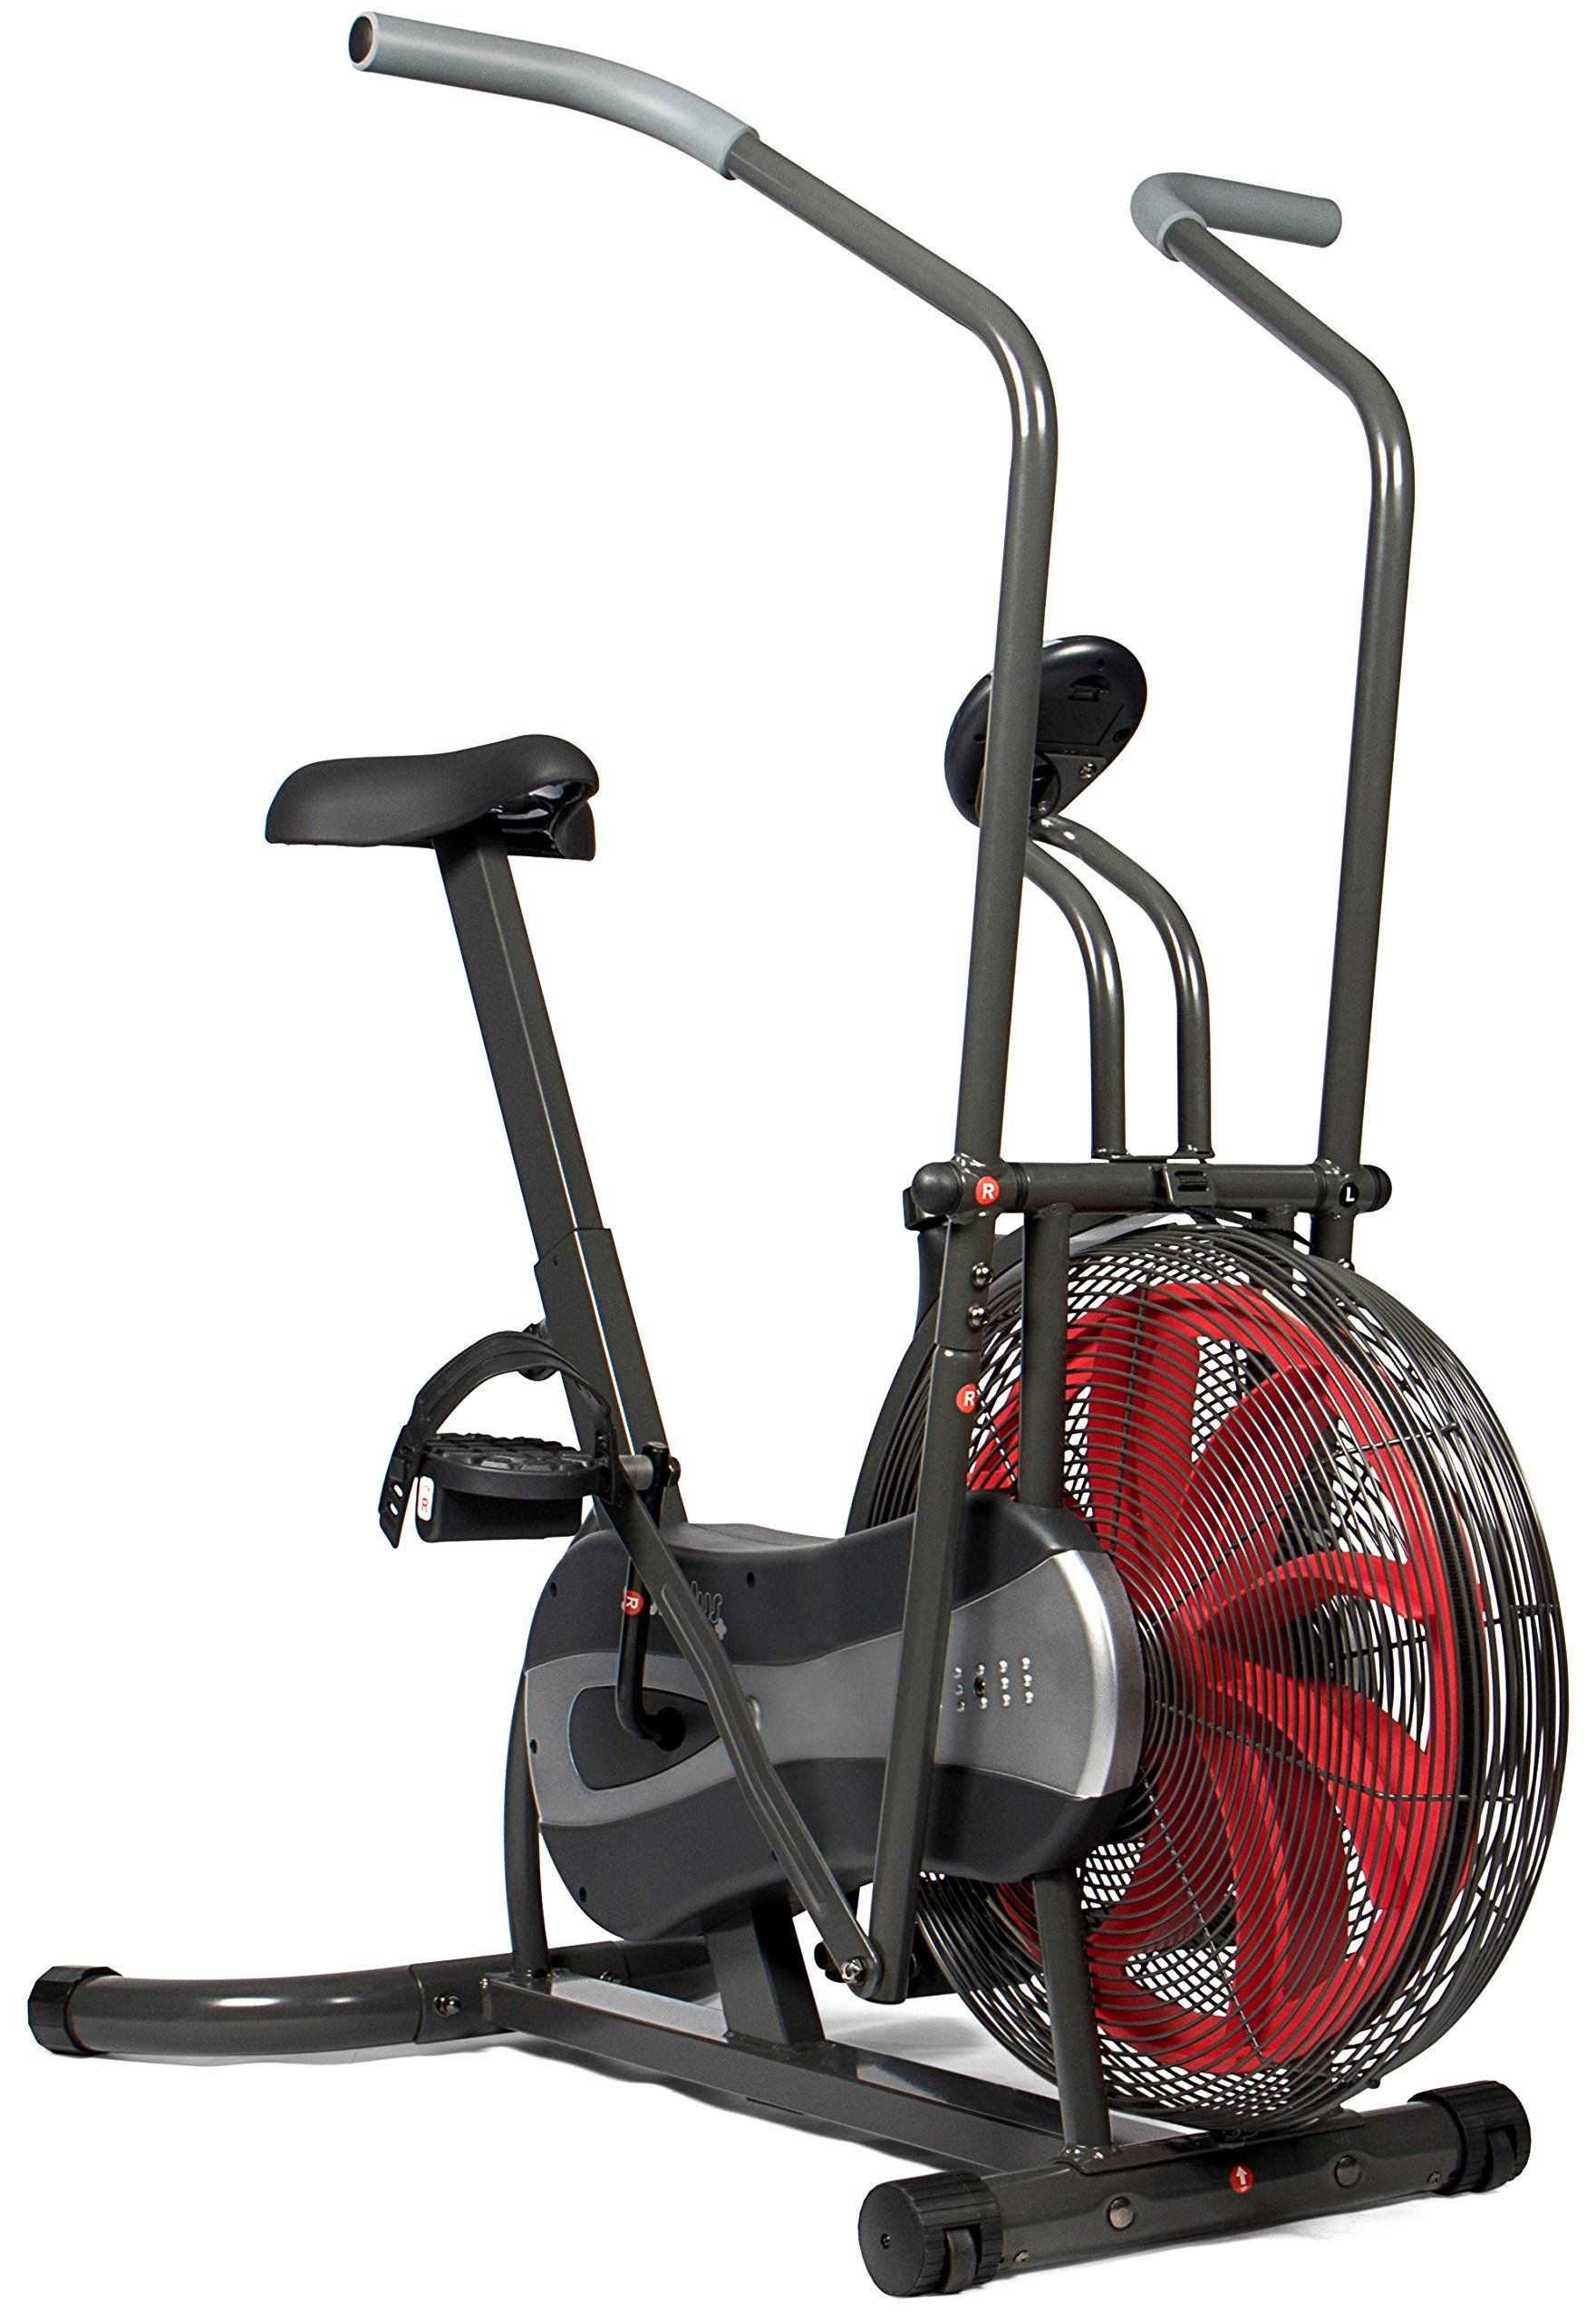 SportPlus Fan Bike – Fan-based and Belt Brake Resistance – Wind Turbine, Full Body Workout – Max. User Weight 100 kg – Safety tested